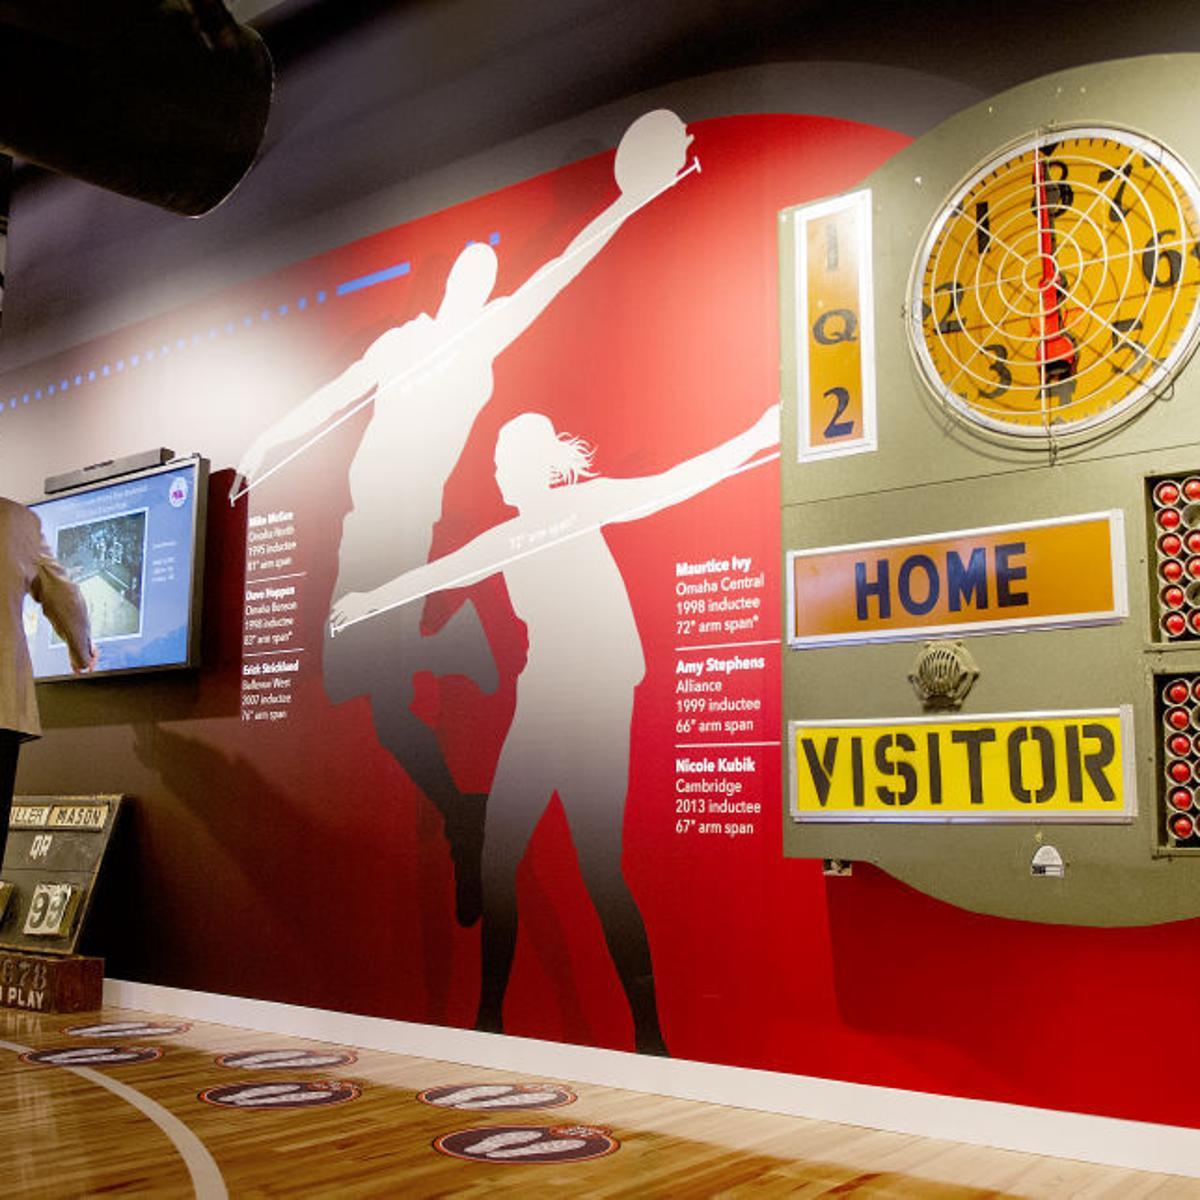 Nebraska High School Sports Hall of Fame hopes its exhibit